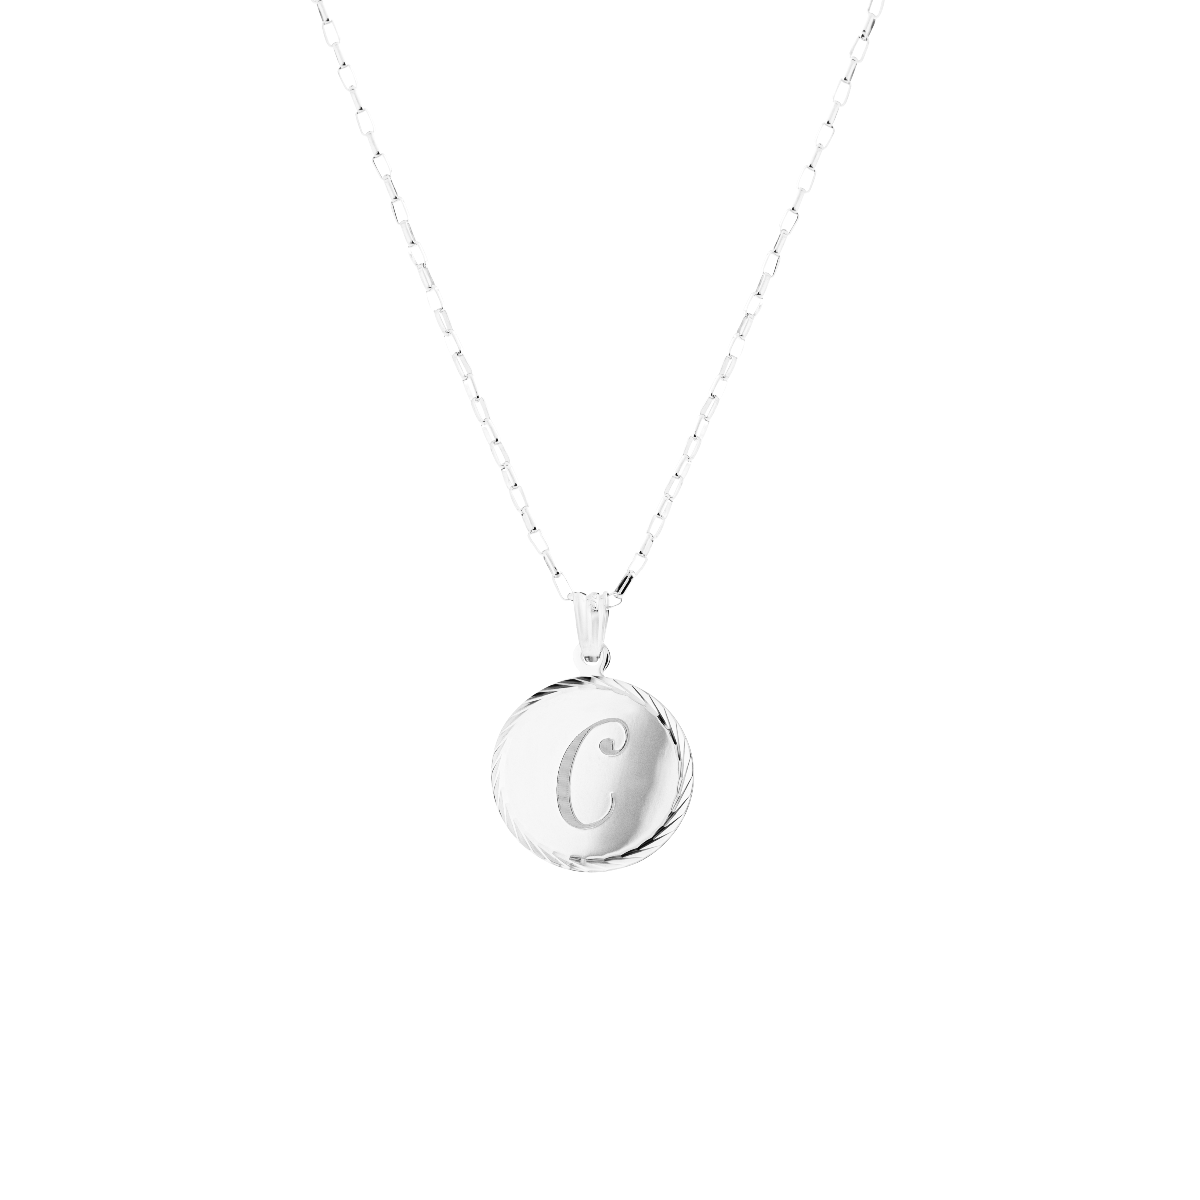 Initial Necklace by Chantal Janzen